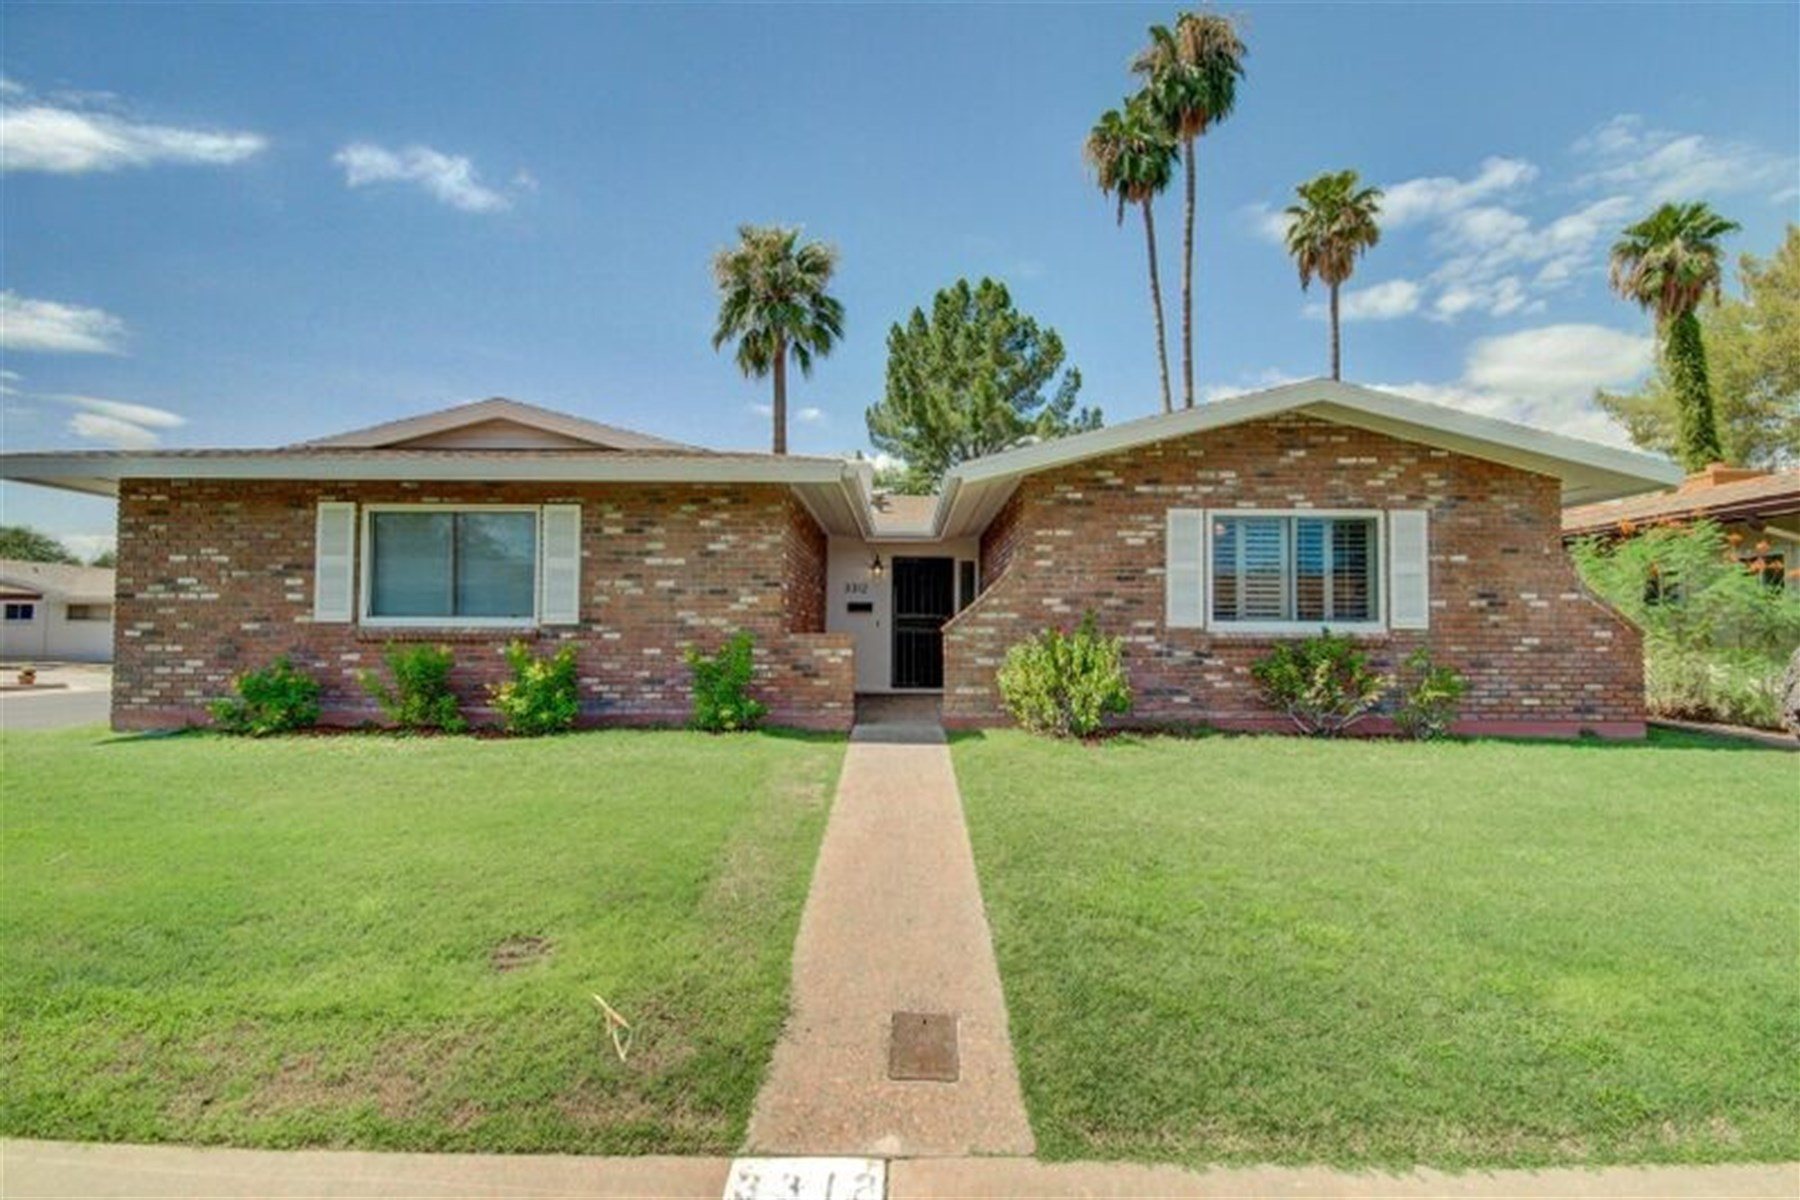 Casa para uma família para Venda às Corner lot in Arcadia Lite has had extensive remodel 3312 N 47TH ST Phoenix, Arizona 85018 Estados Unidos